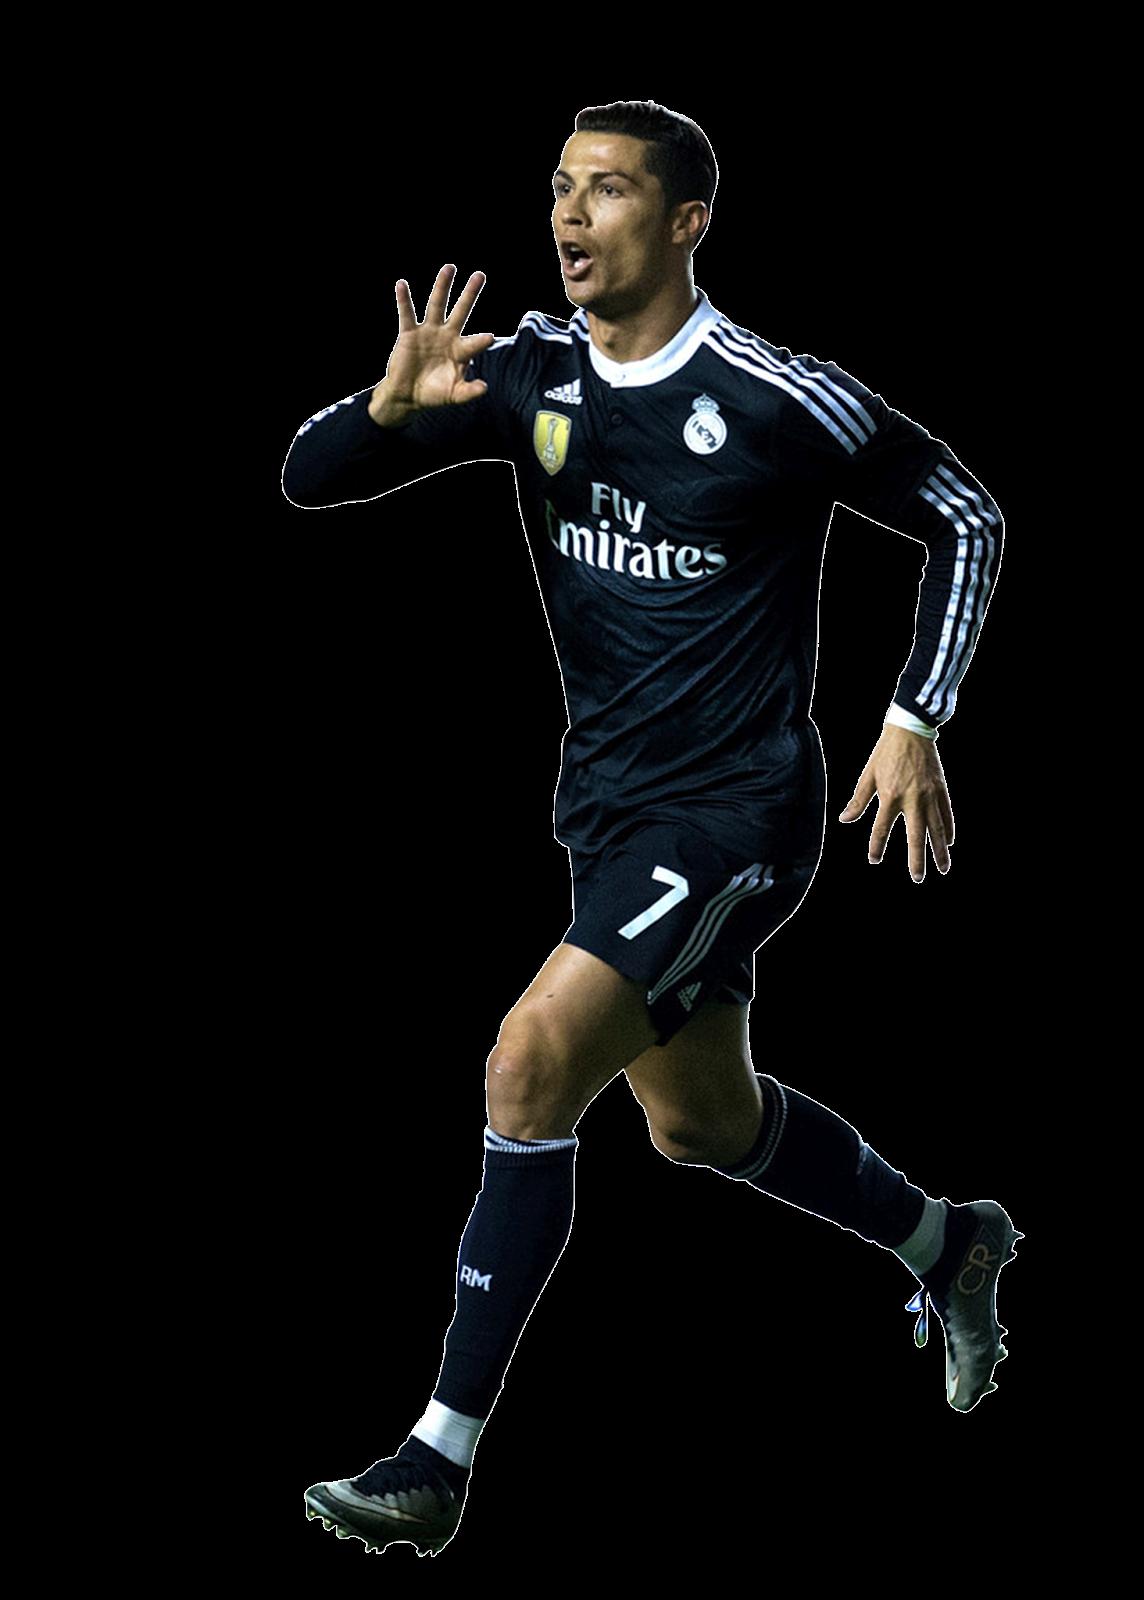 Bola Render: Cristiano Ronaldo